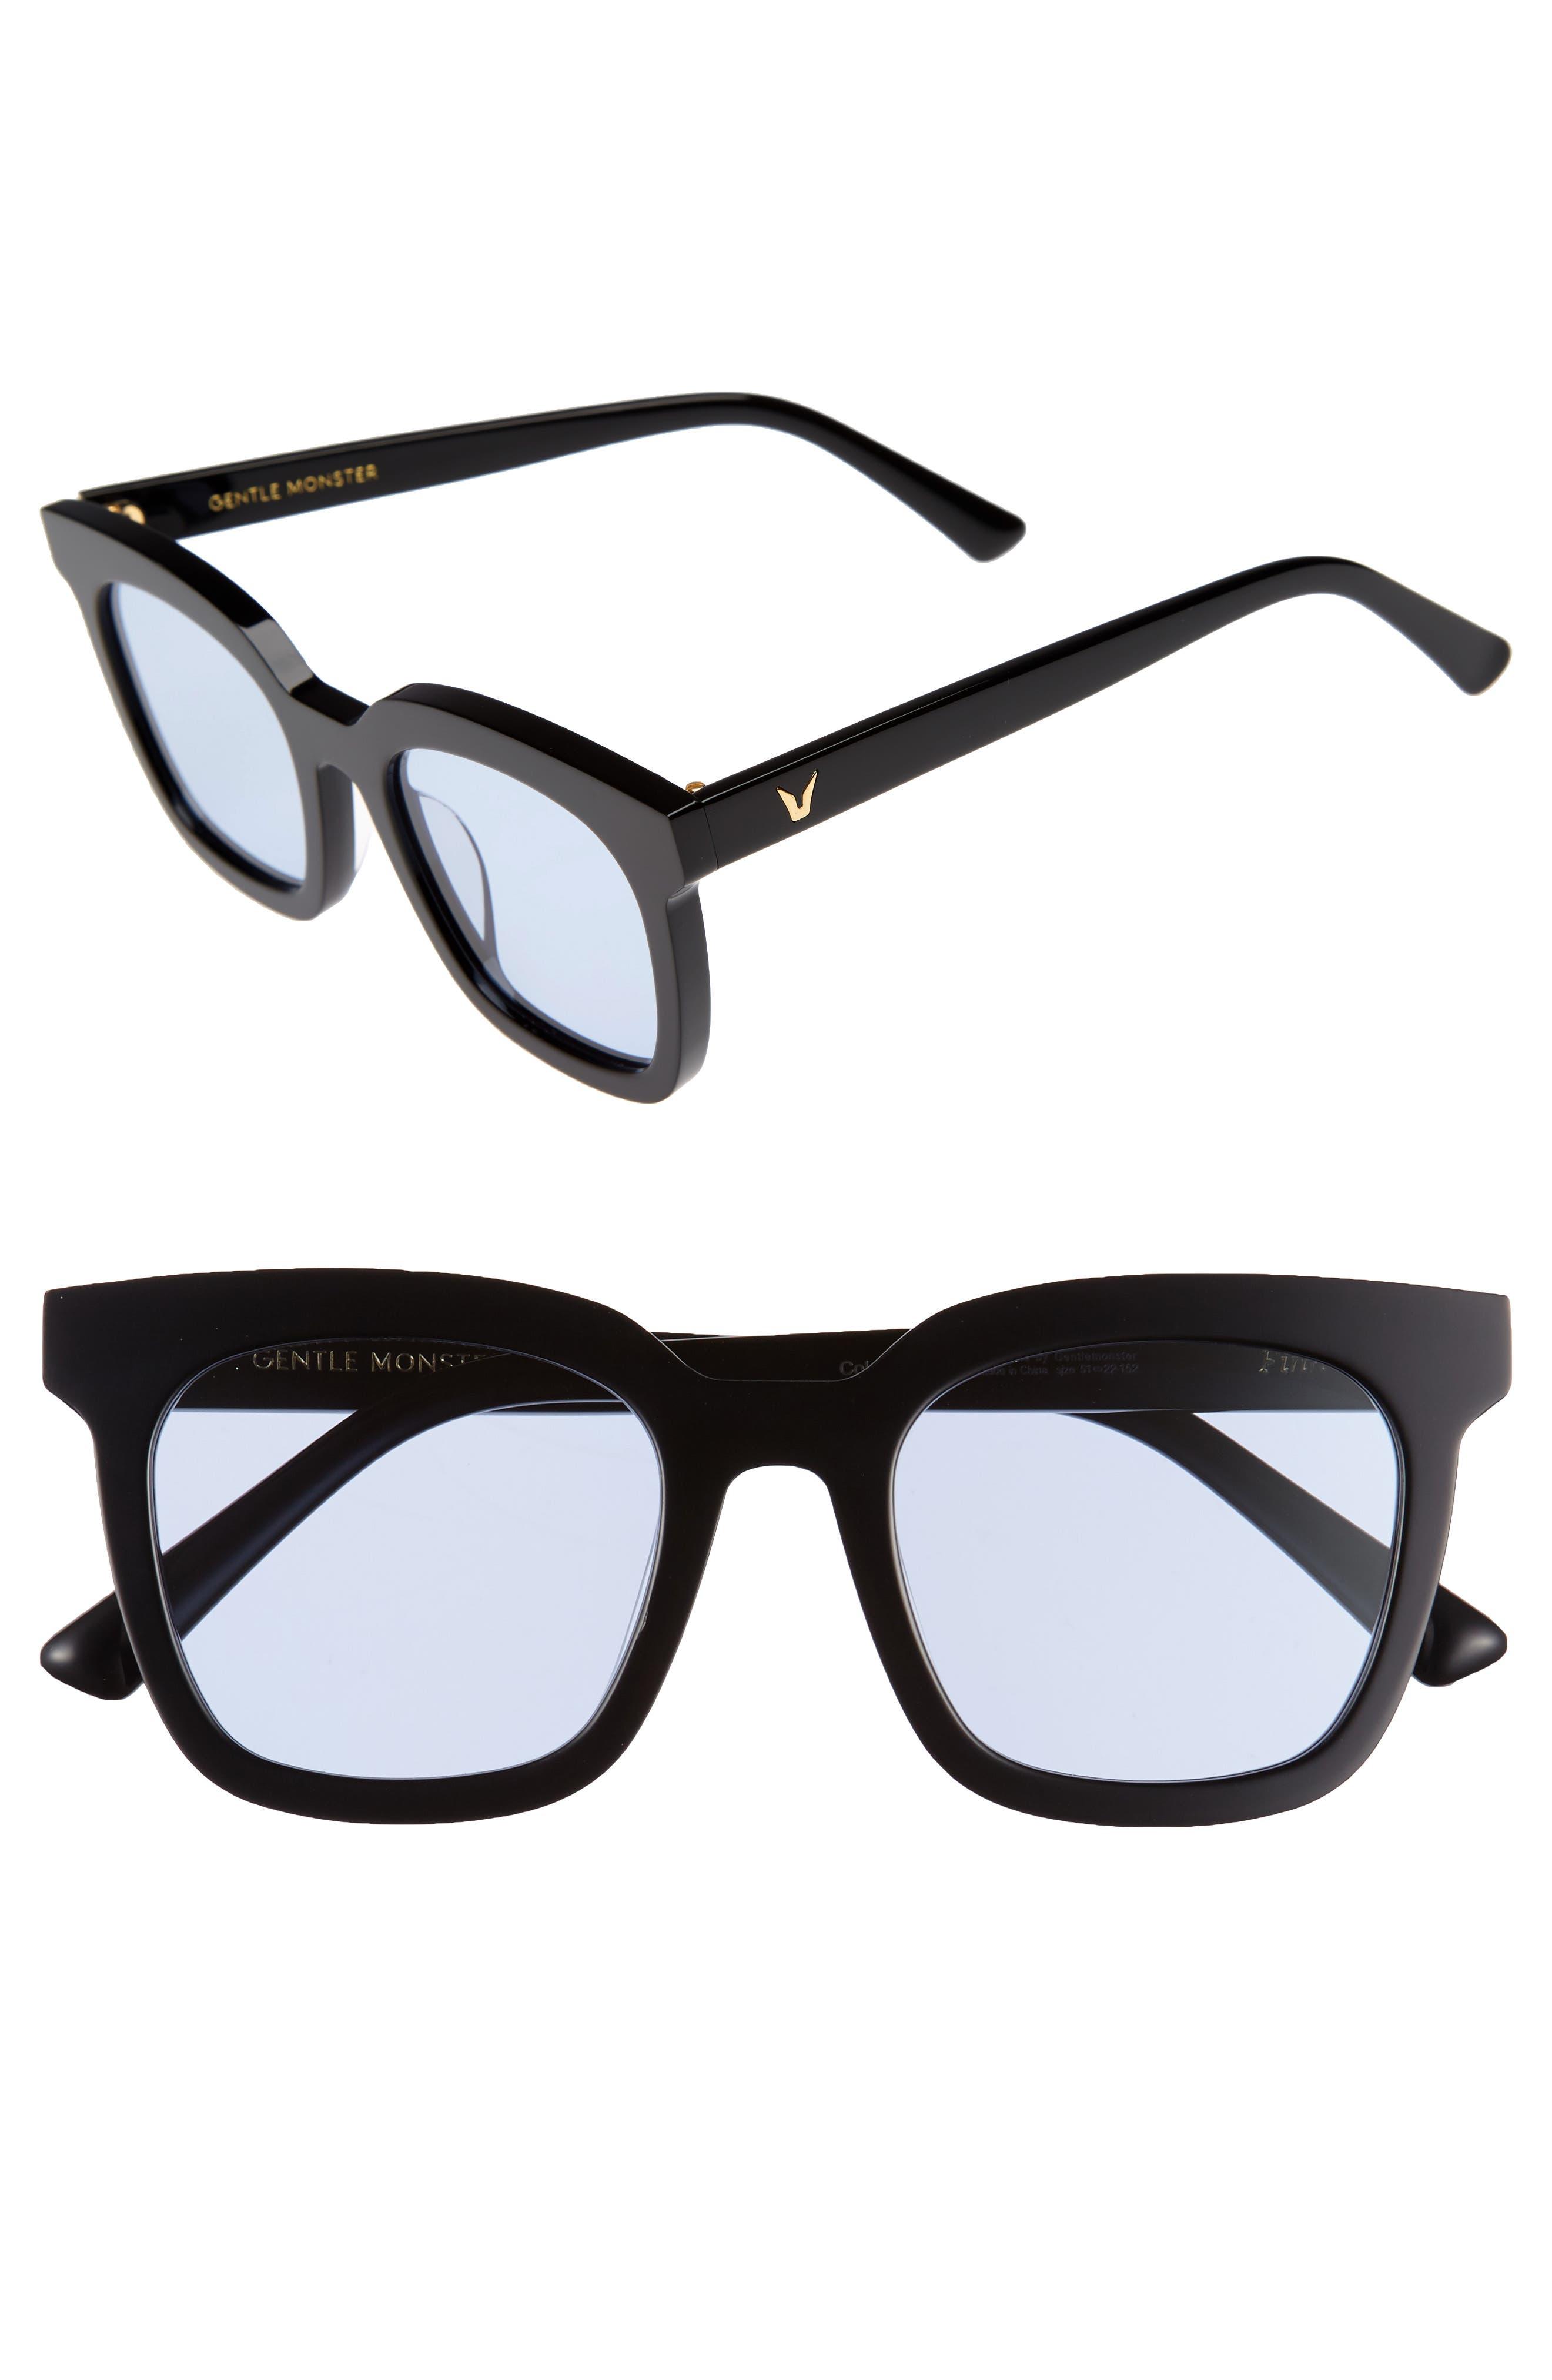 Finn 51mm Sunglasses,                             Main thumbnail 1, color,                             Black/ Blue